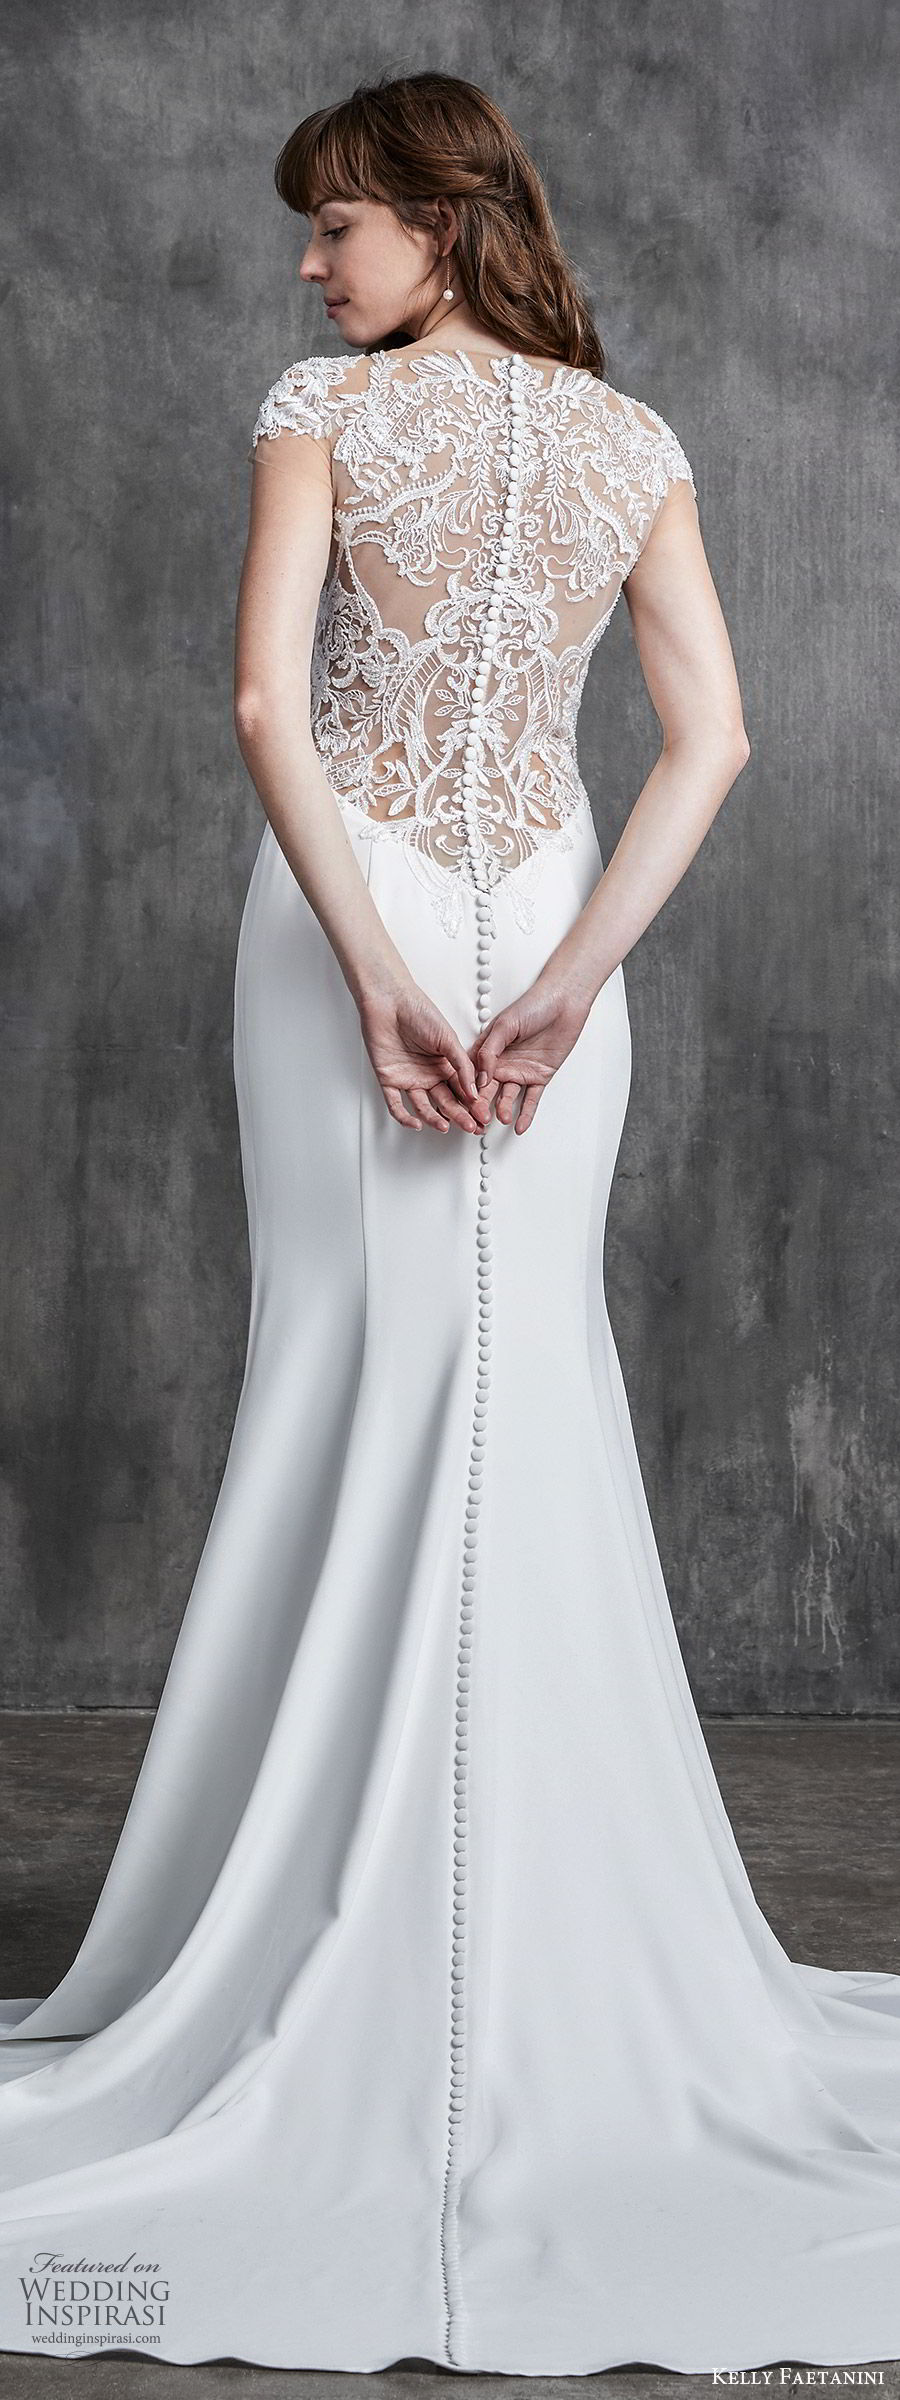 kelly faetanini spring 2020 bridal cap sleeves illusion bodice bateau neckline sheer lace bodice fit flare sheath mermaid wedding dress (1) elegant romantic sheer back chapel train lv